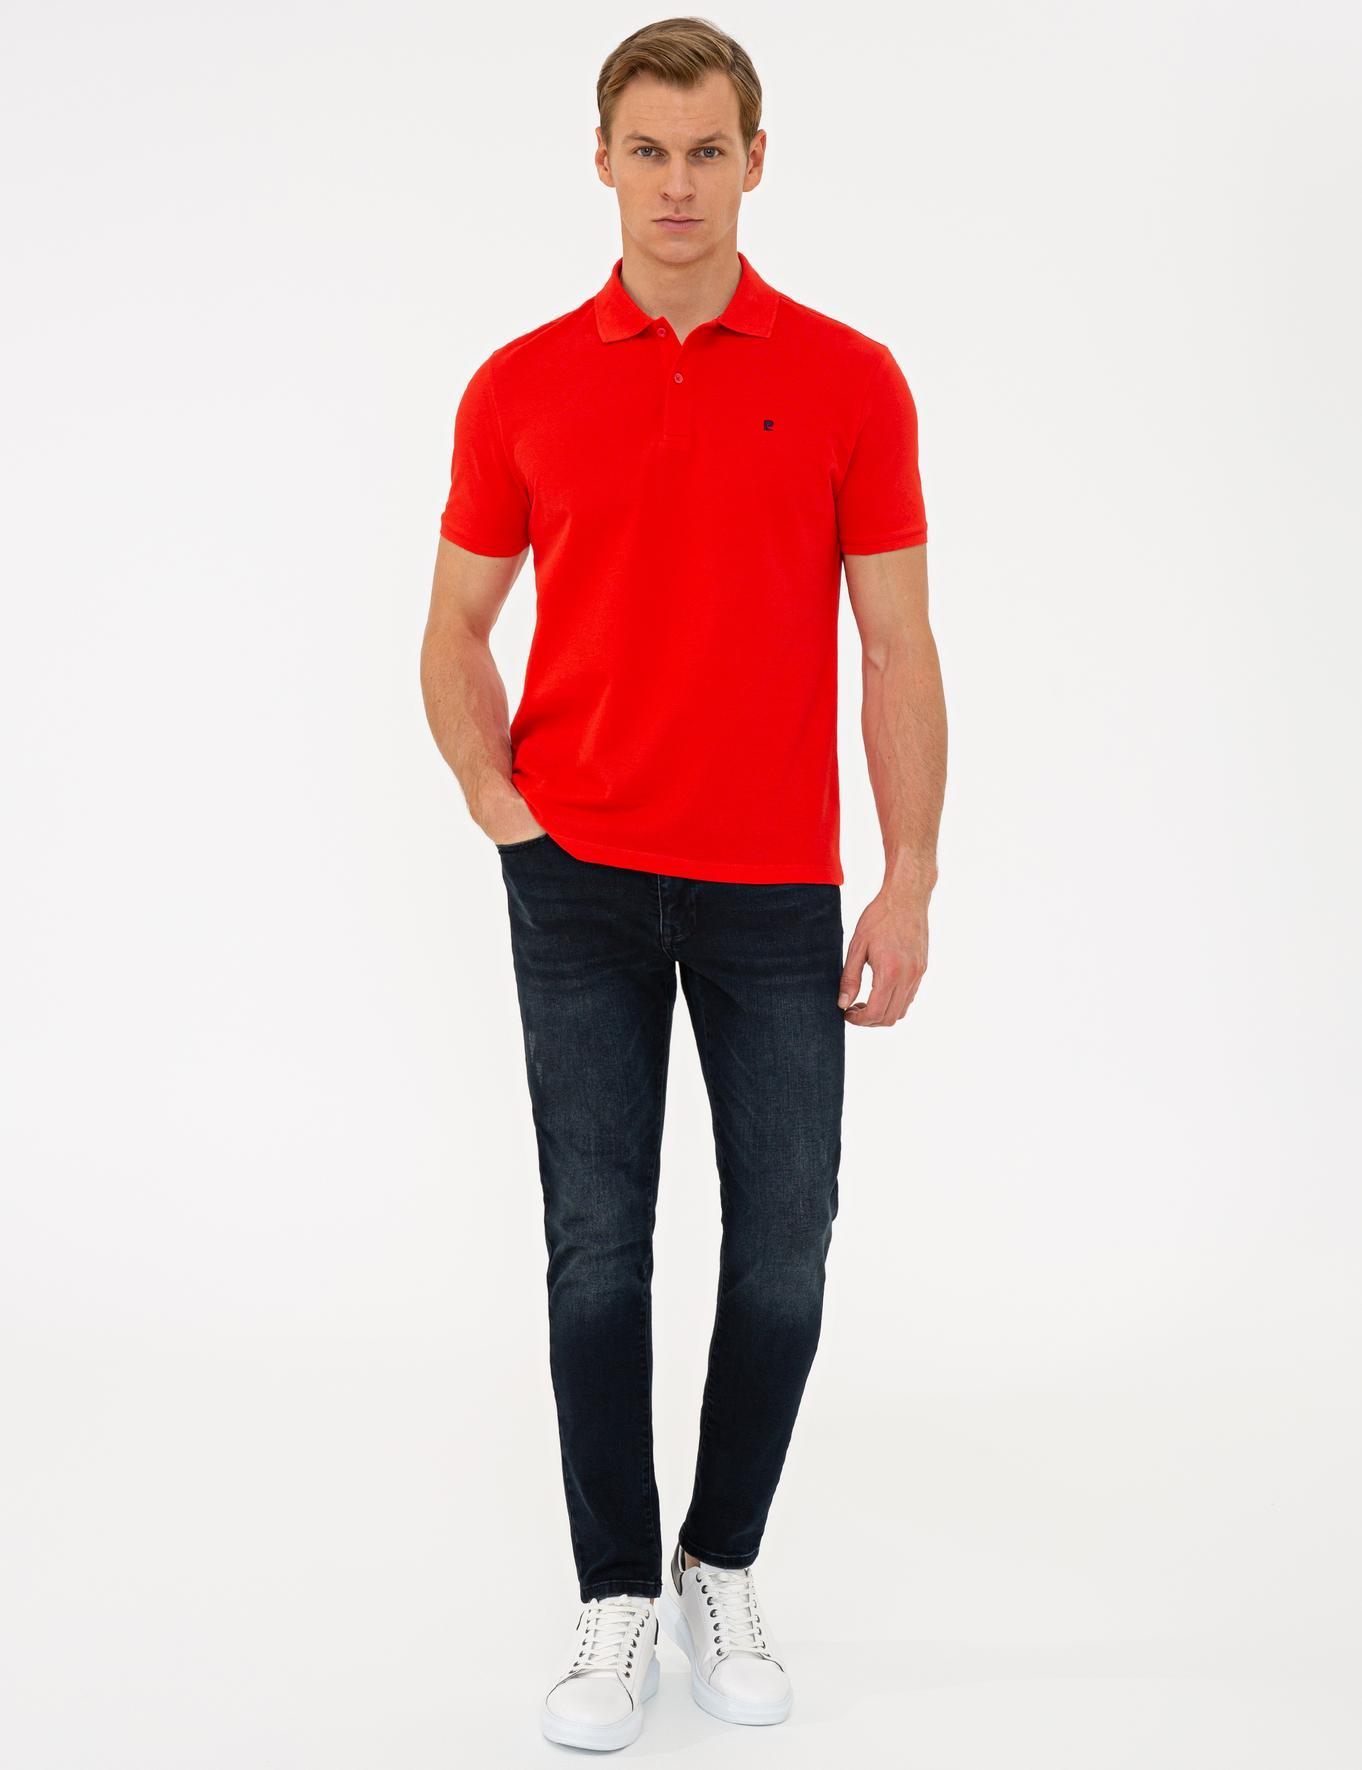 Nar Çiçeği Slim Fit Basic Polo Yaka T-Shirt